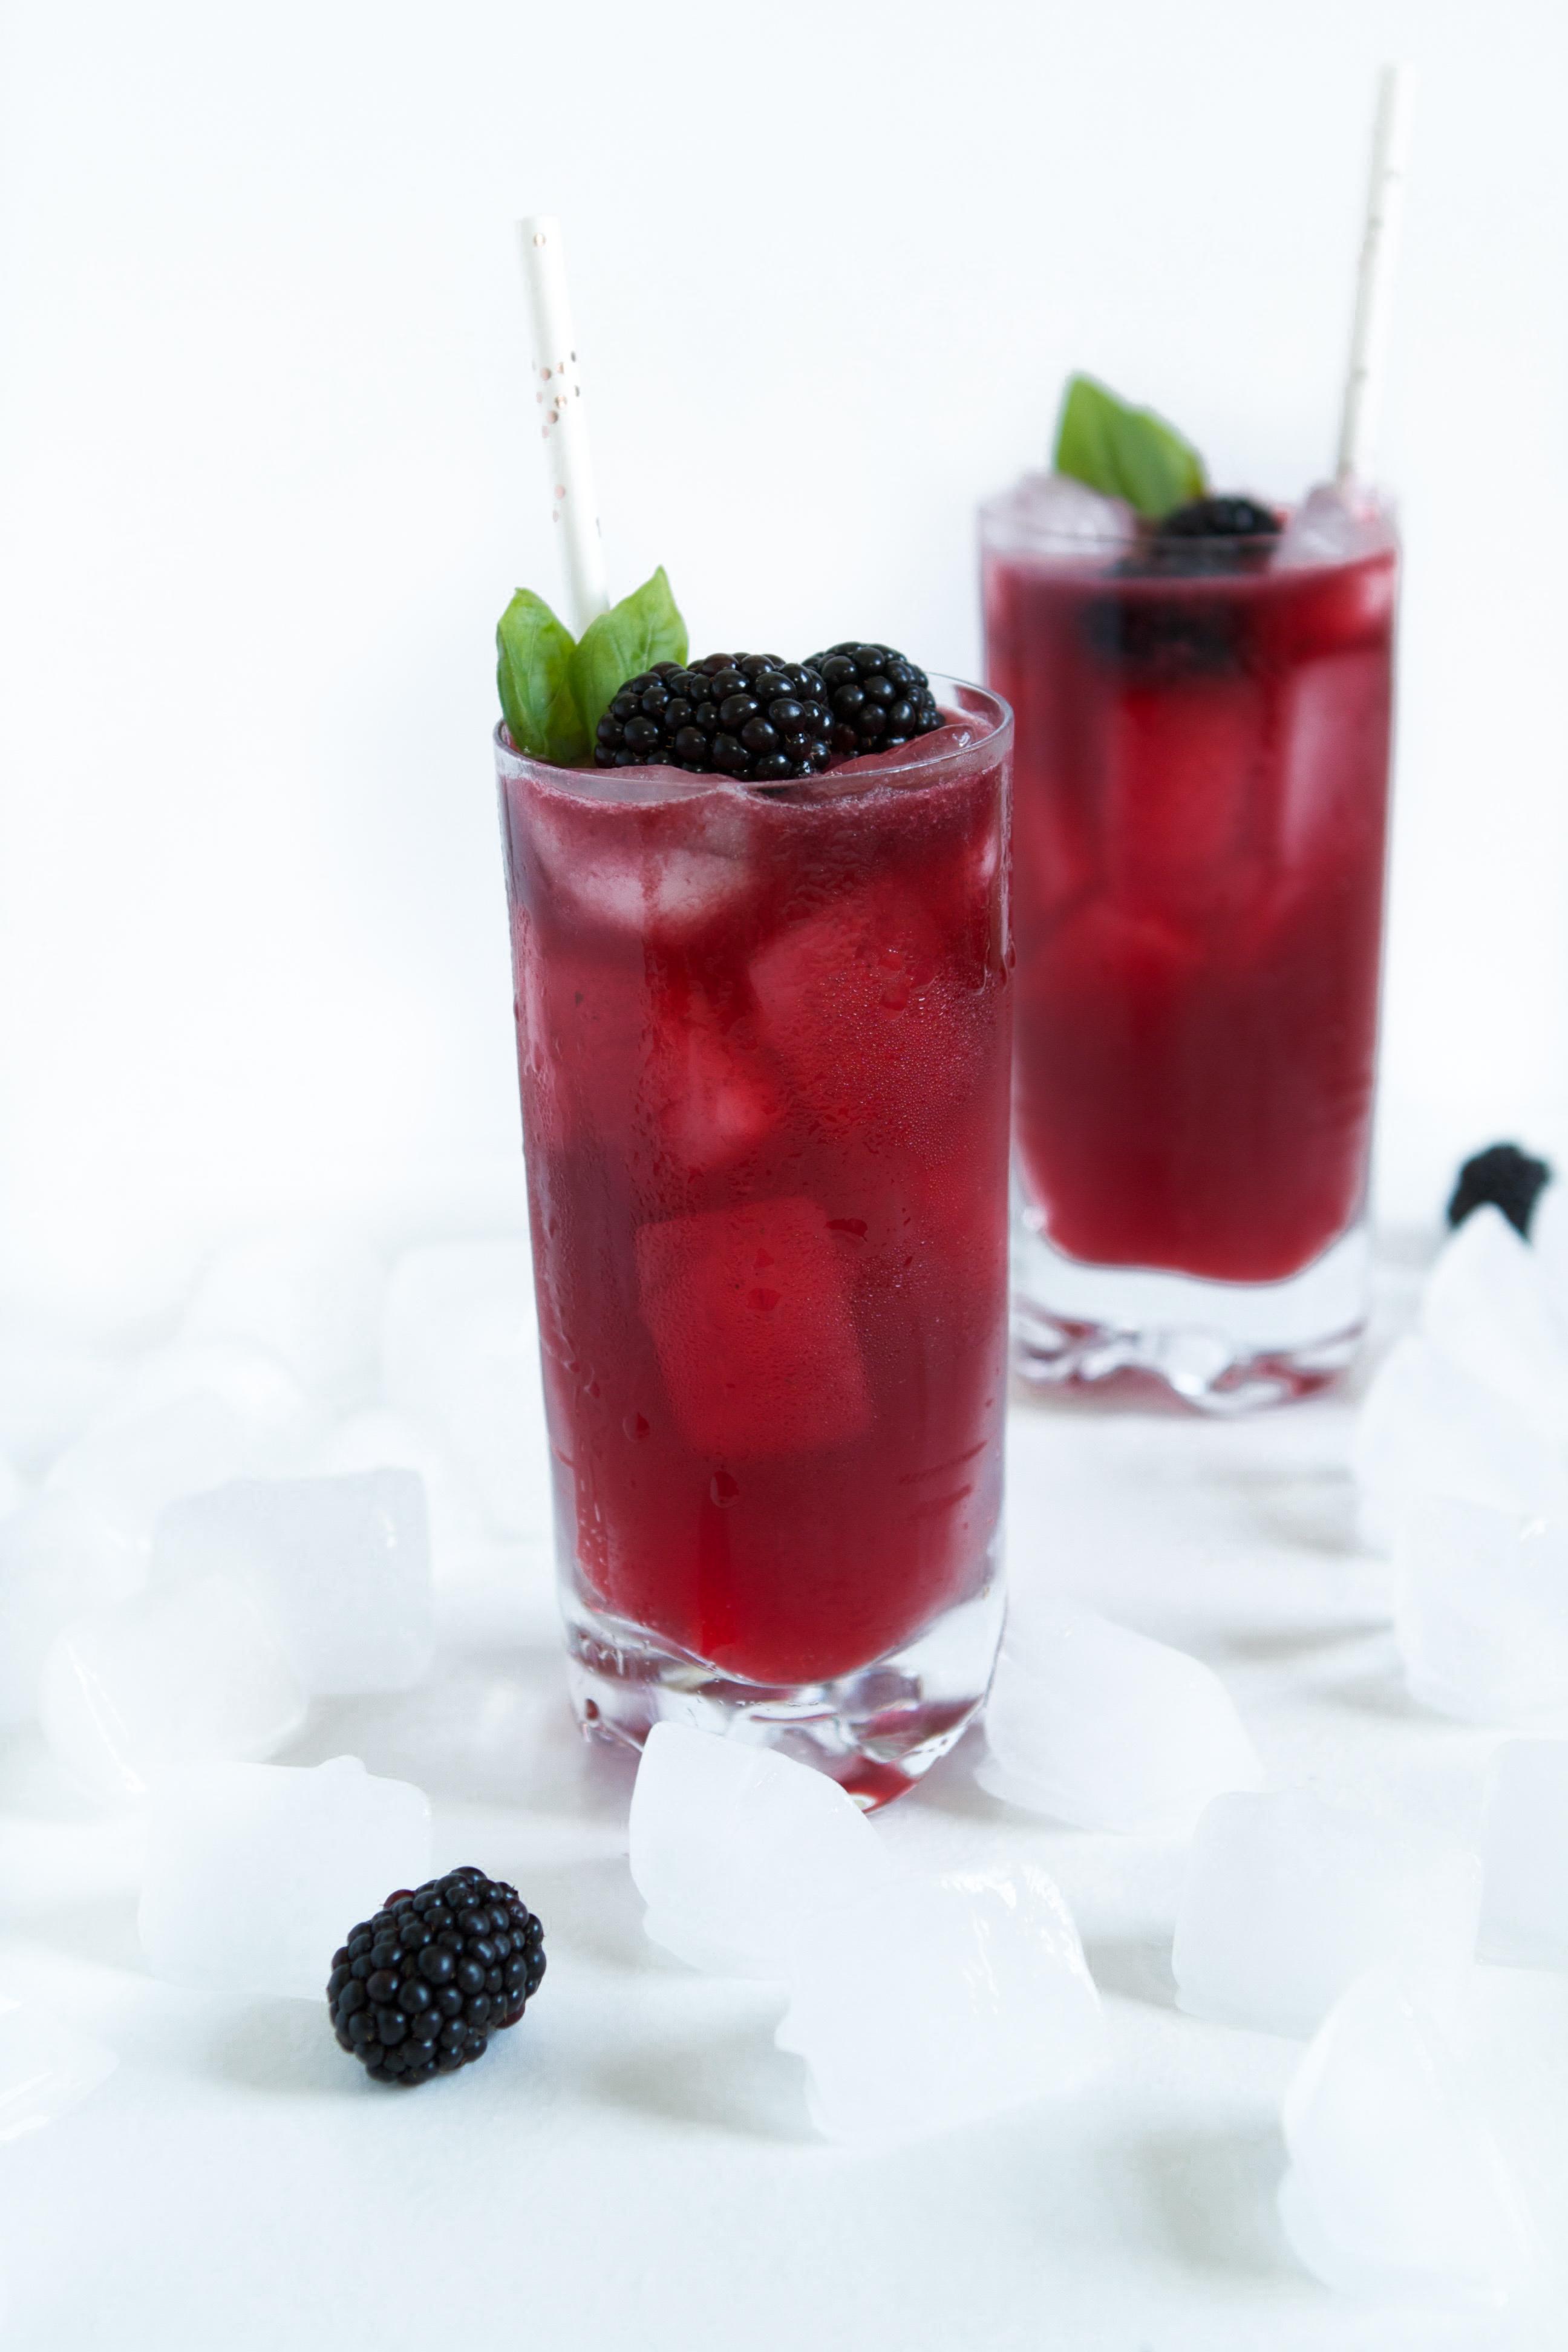 Blackberry & Basil Gin Smash | Zestful Kitchen